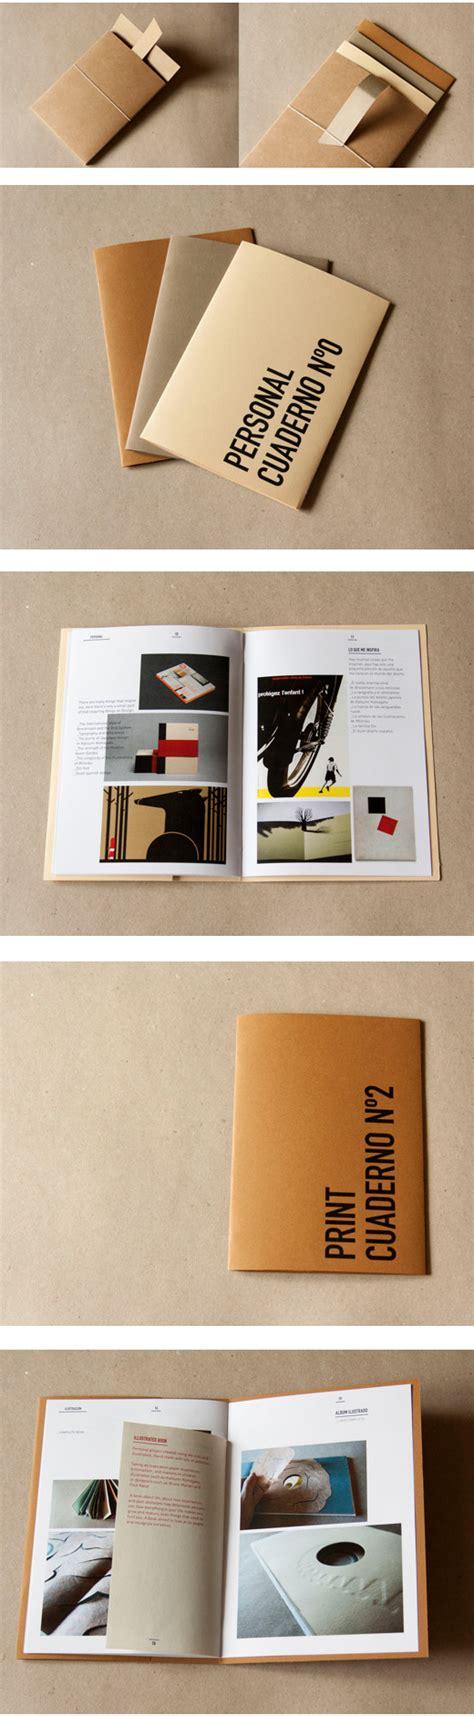 graphic design portfolio layout print 5 most impressive graphic design print portfolios